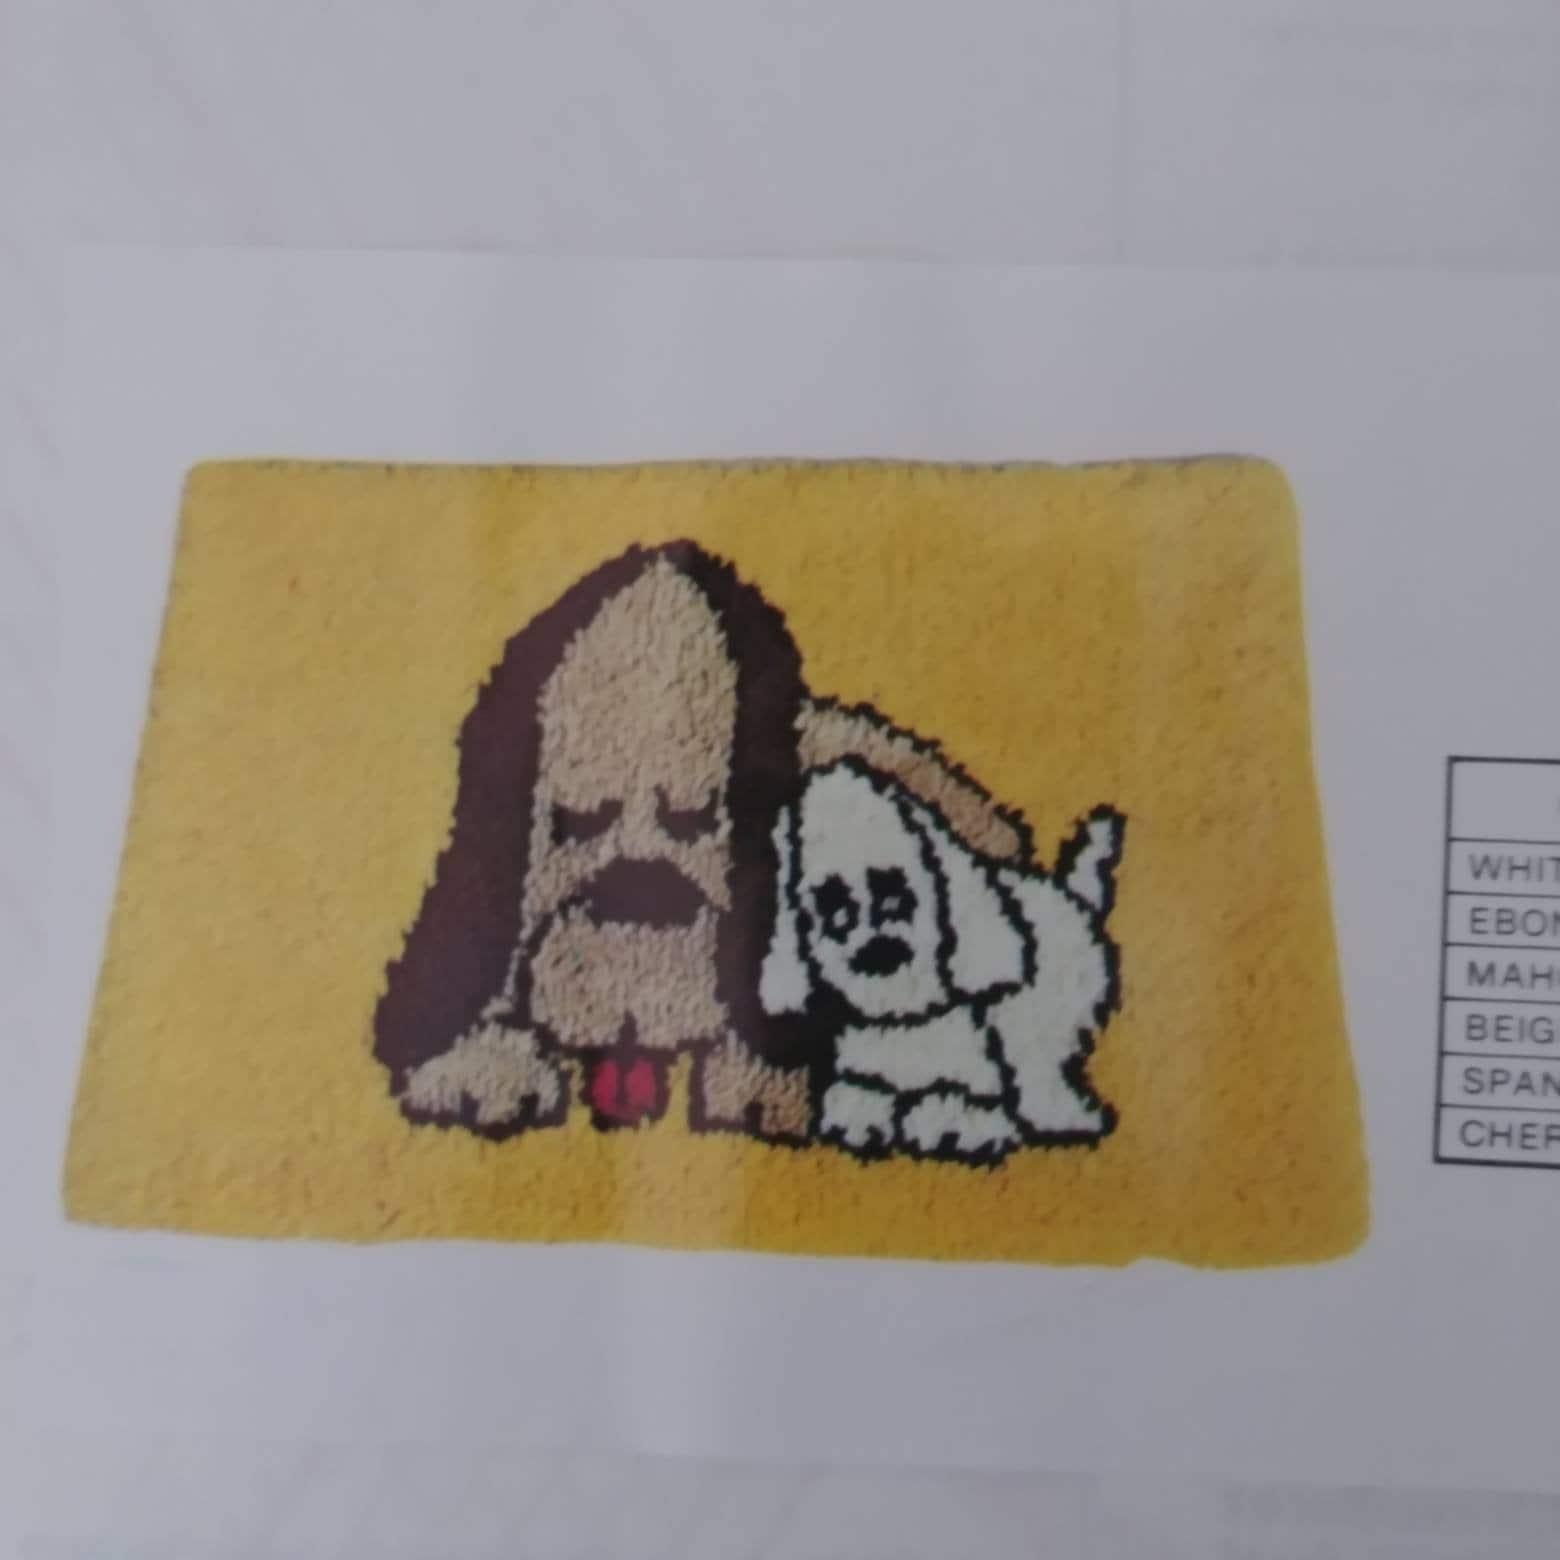 Dog Rug Hooking Canvas 20x27 Inches Locker Hooking Pattern Children S Bath Mat Dog Lovers Best Friend Shag Mat Printed Canvas